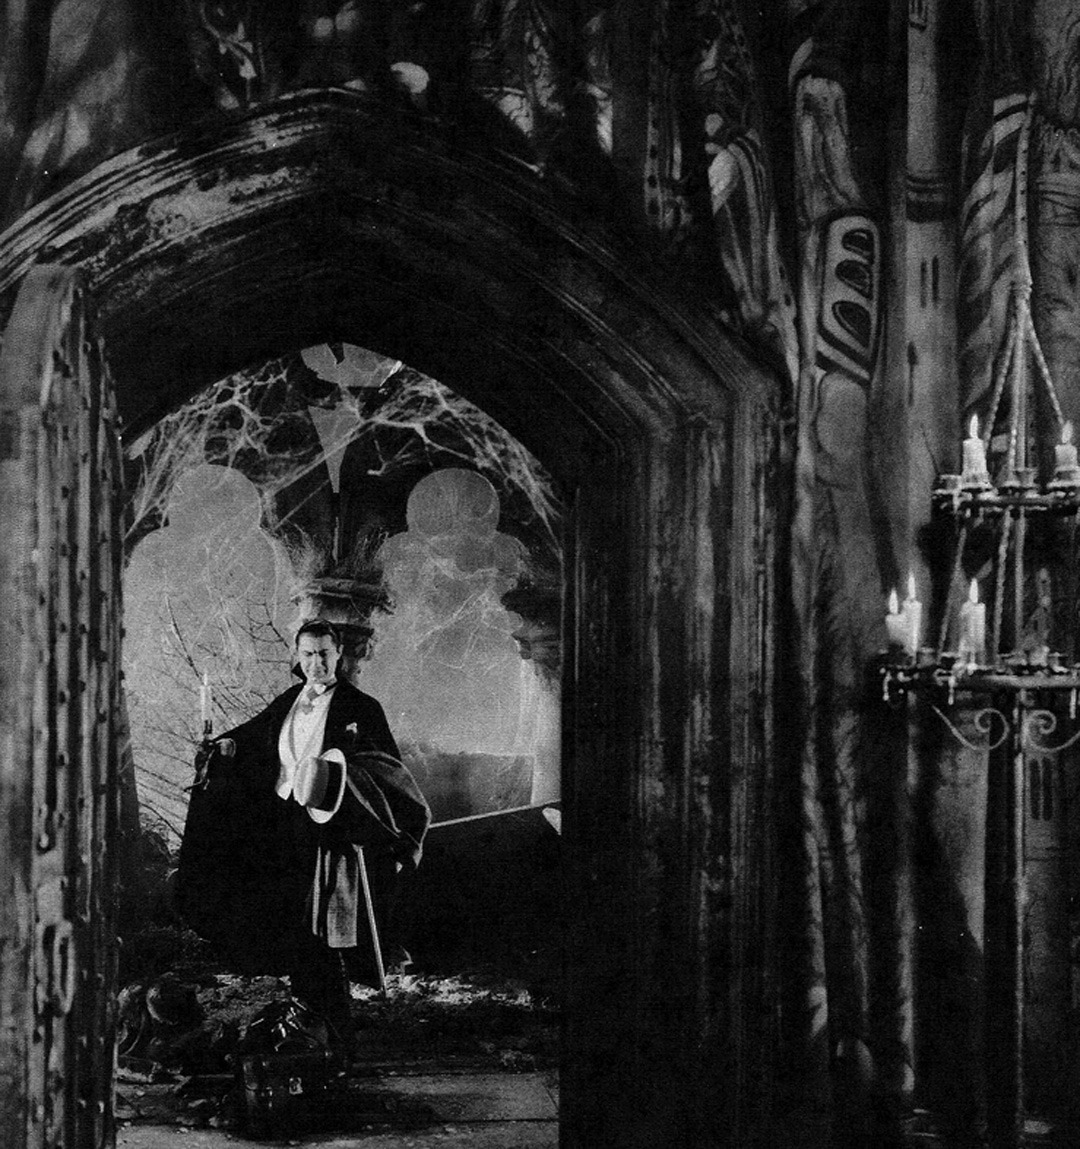 silverscreams:  Bela Lugosi in DRACULA, 1931.